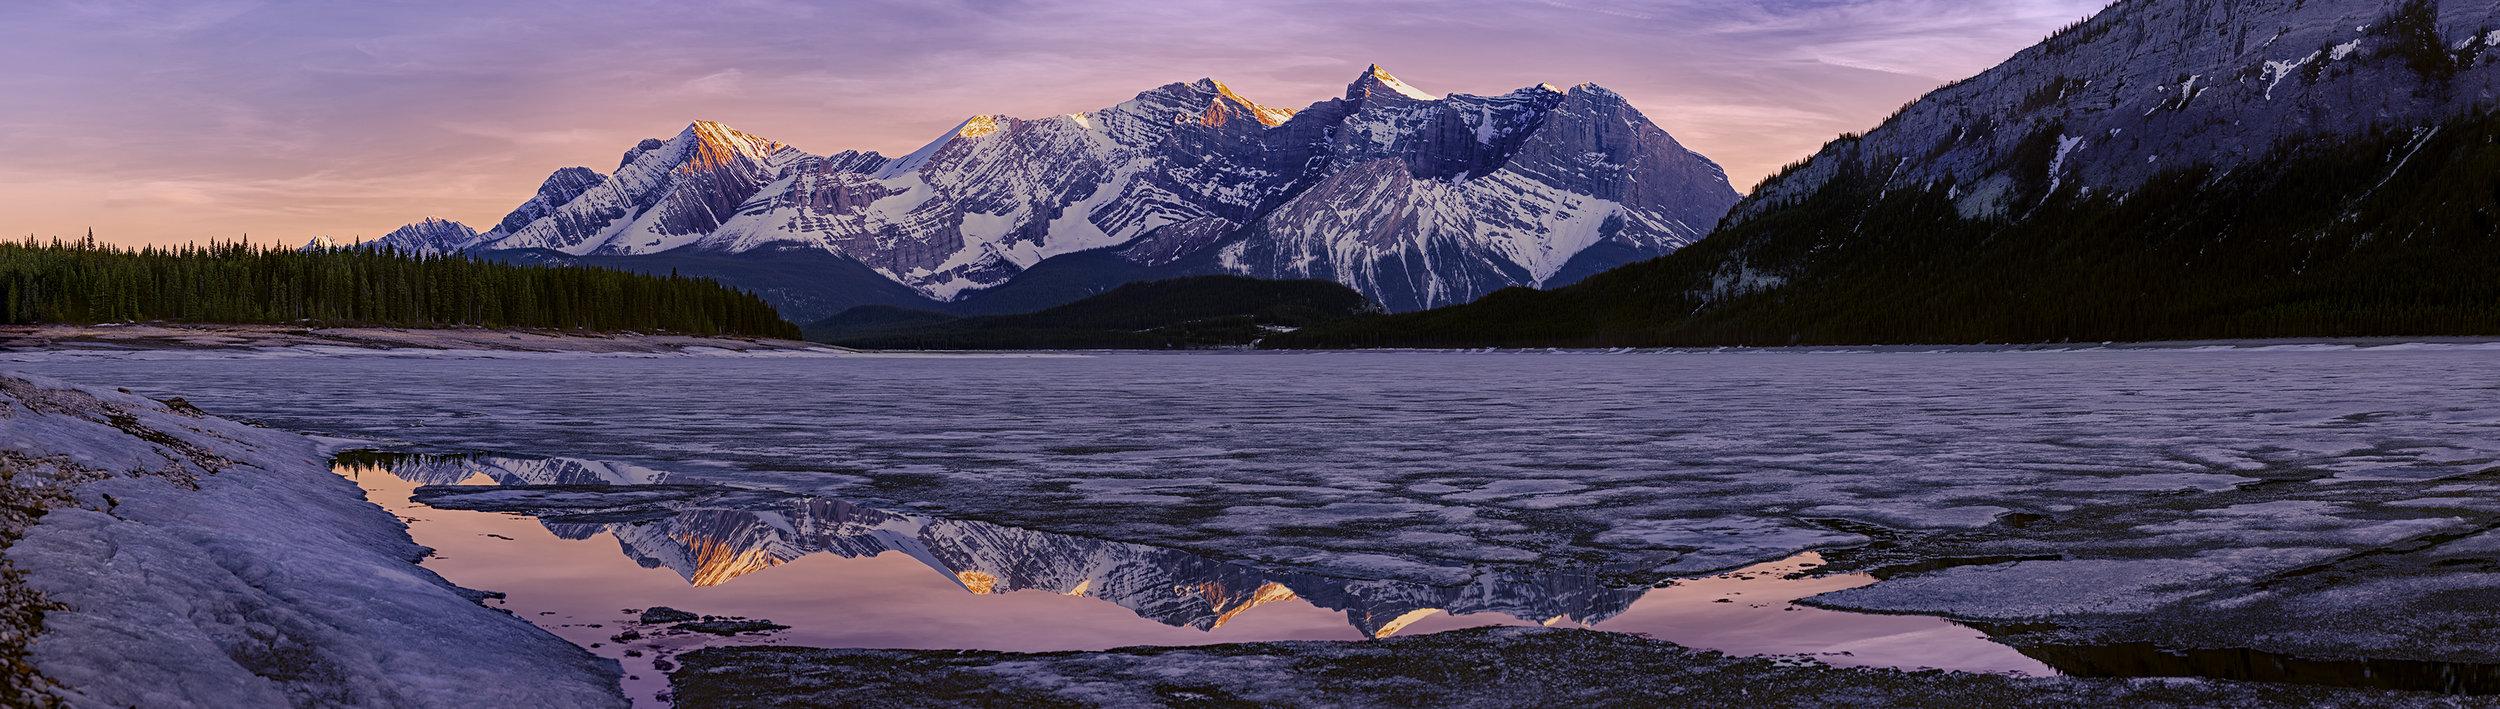 kaninaskis lake small.jpg